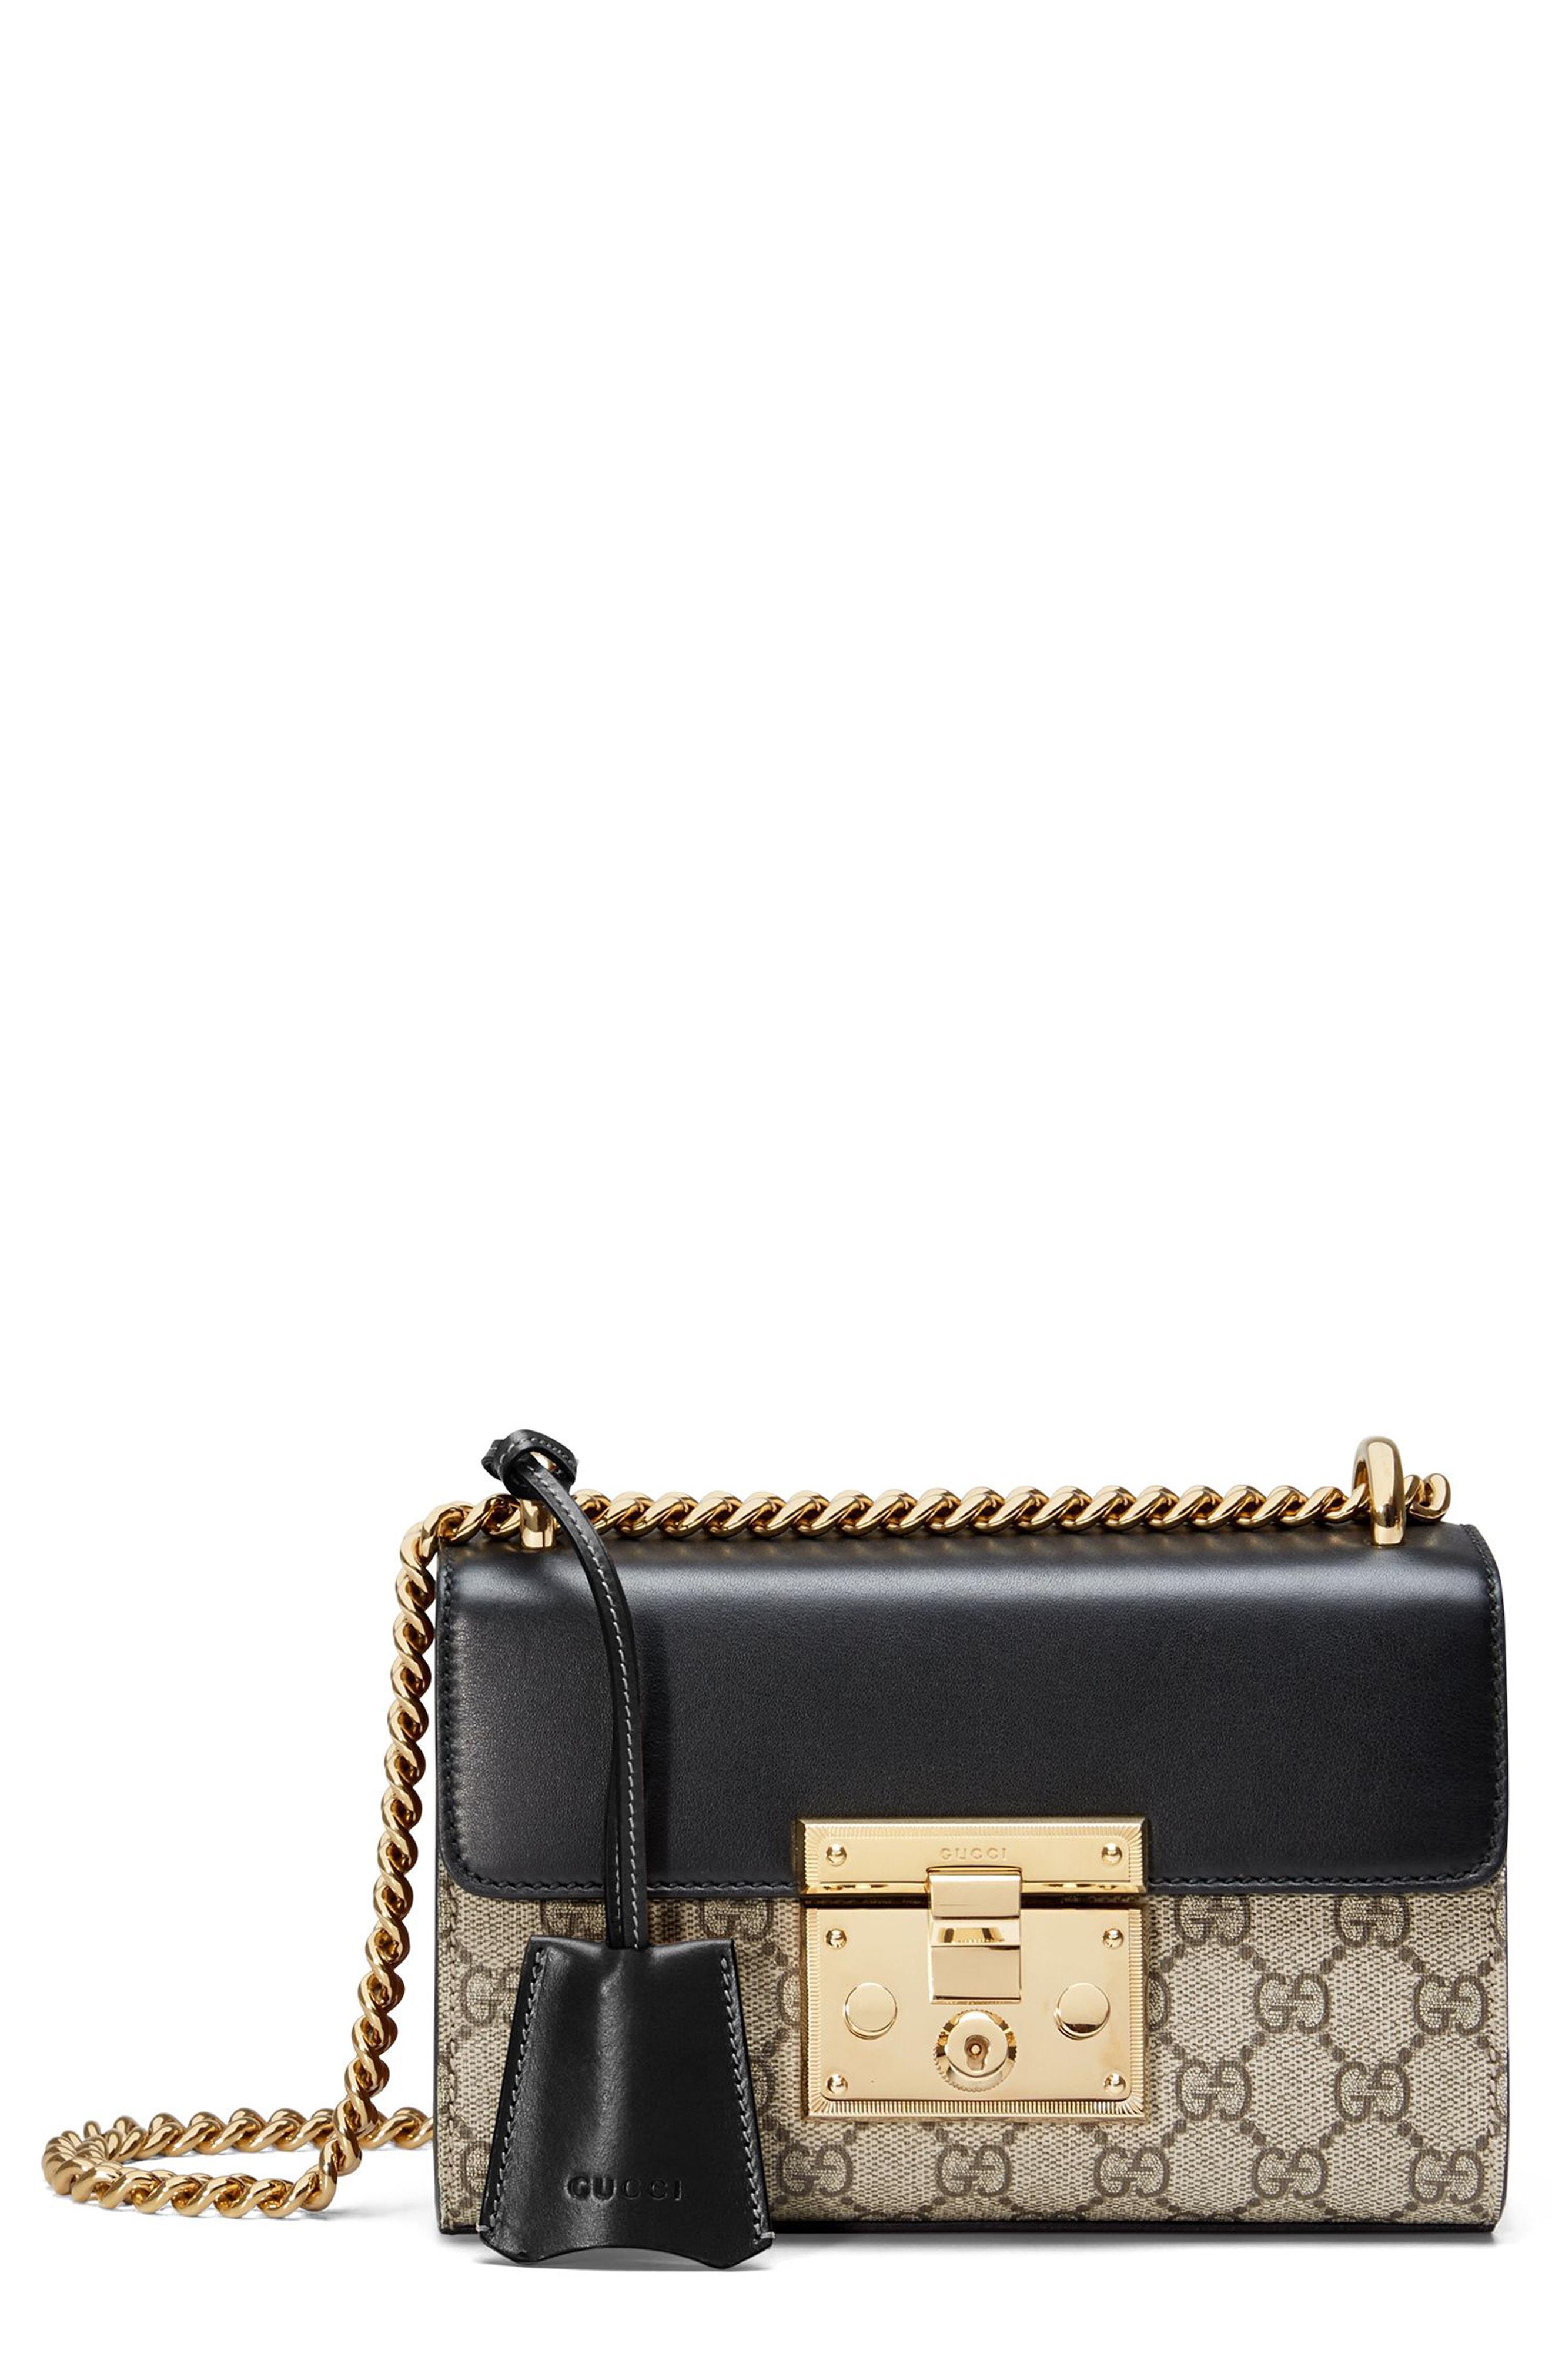 24b45dde0 Gucci - Black Small Padlock Gg Supreme Canvas & Leather Shoulder Bag -  Lyst. View fullscreen